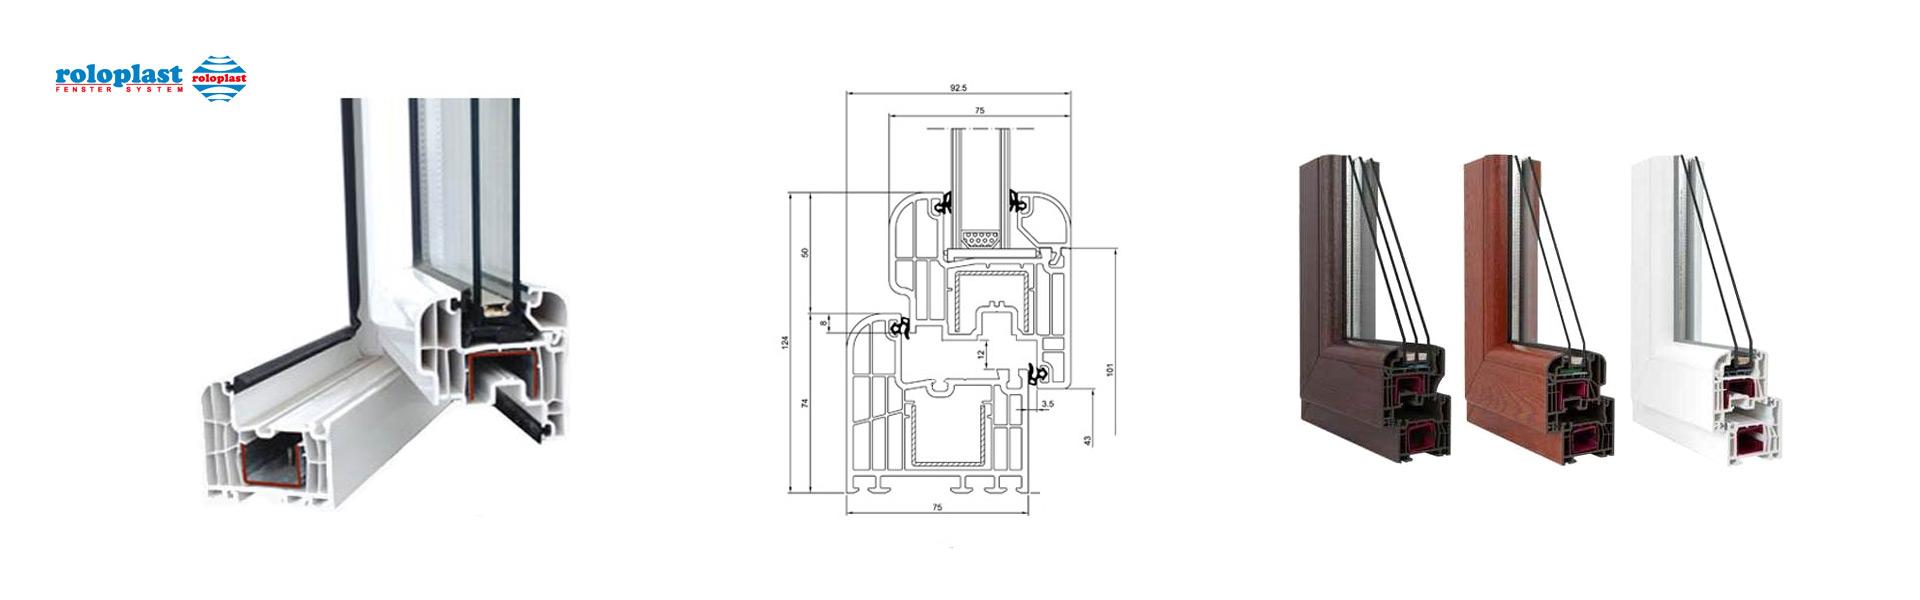 Roloplast PVC Profili